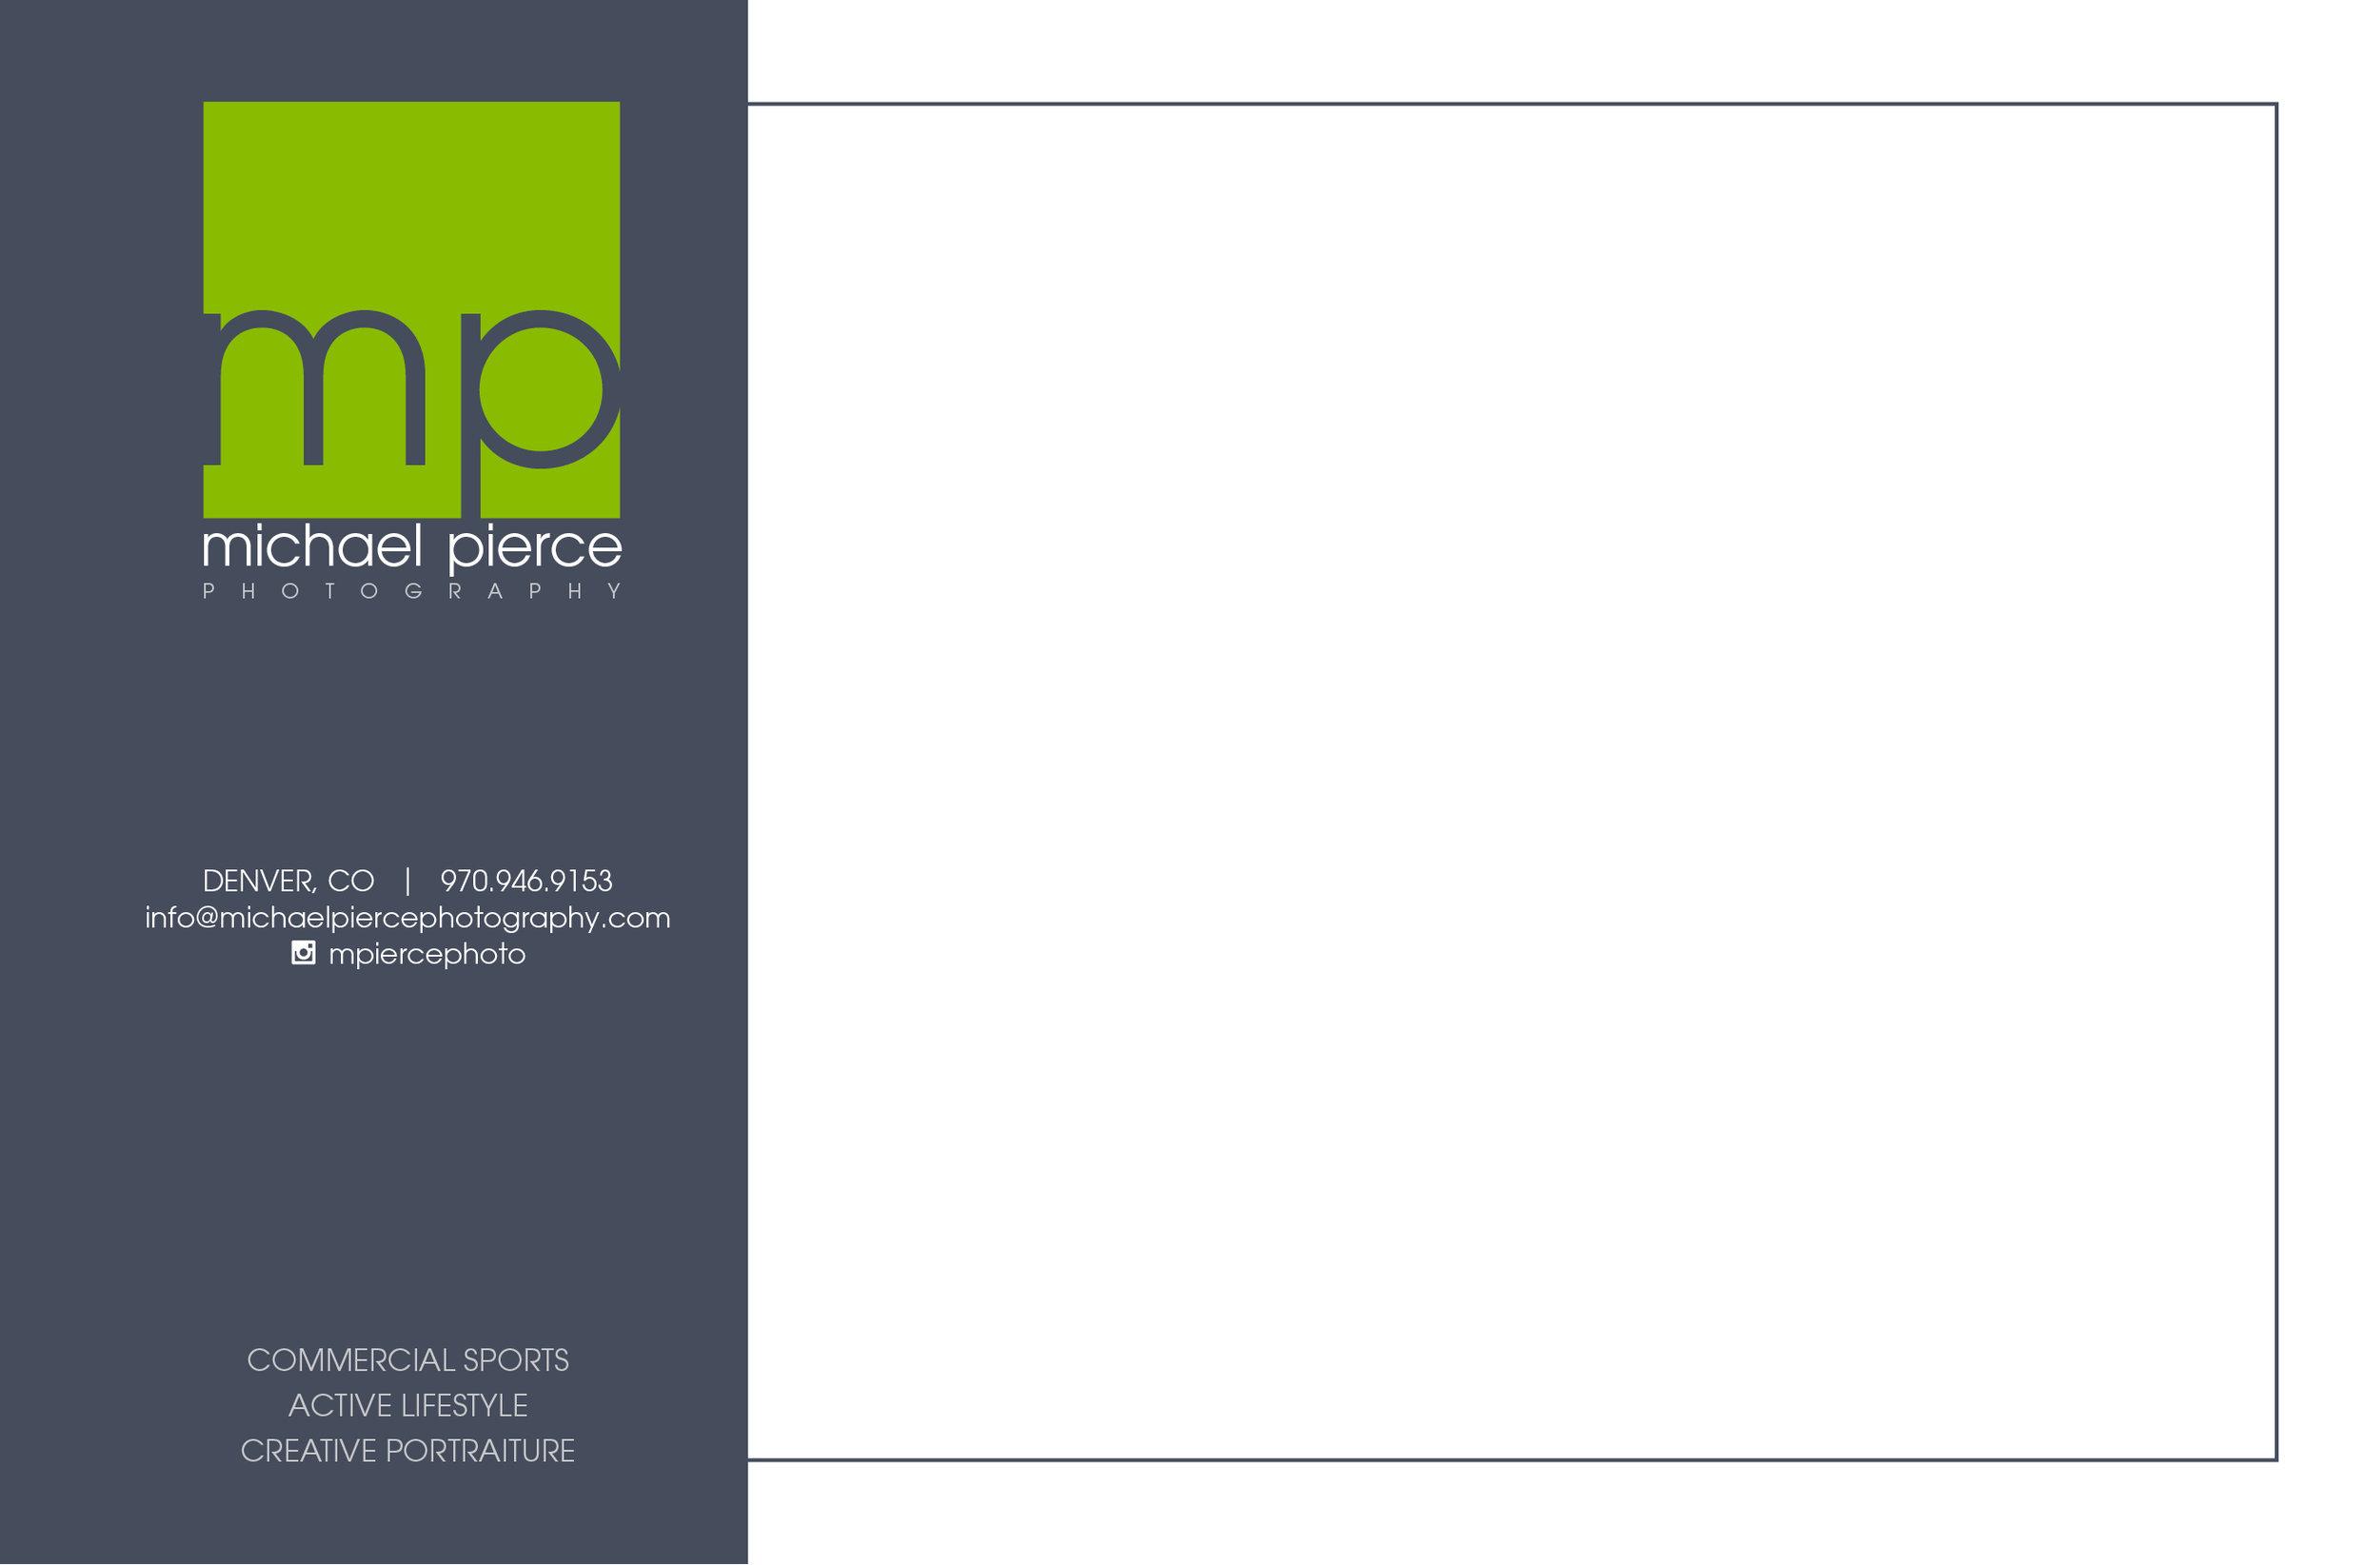 comp-card 8.5x5.52.jpg